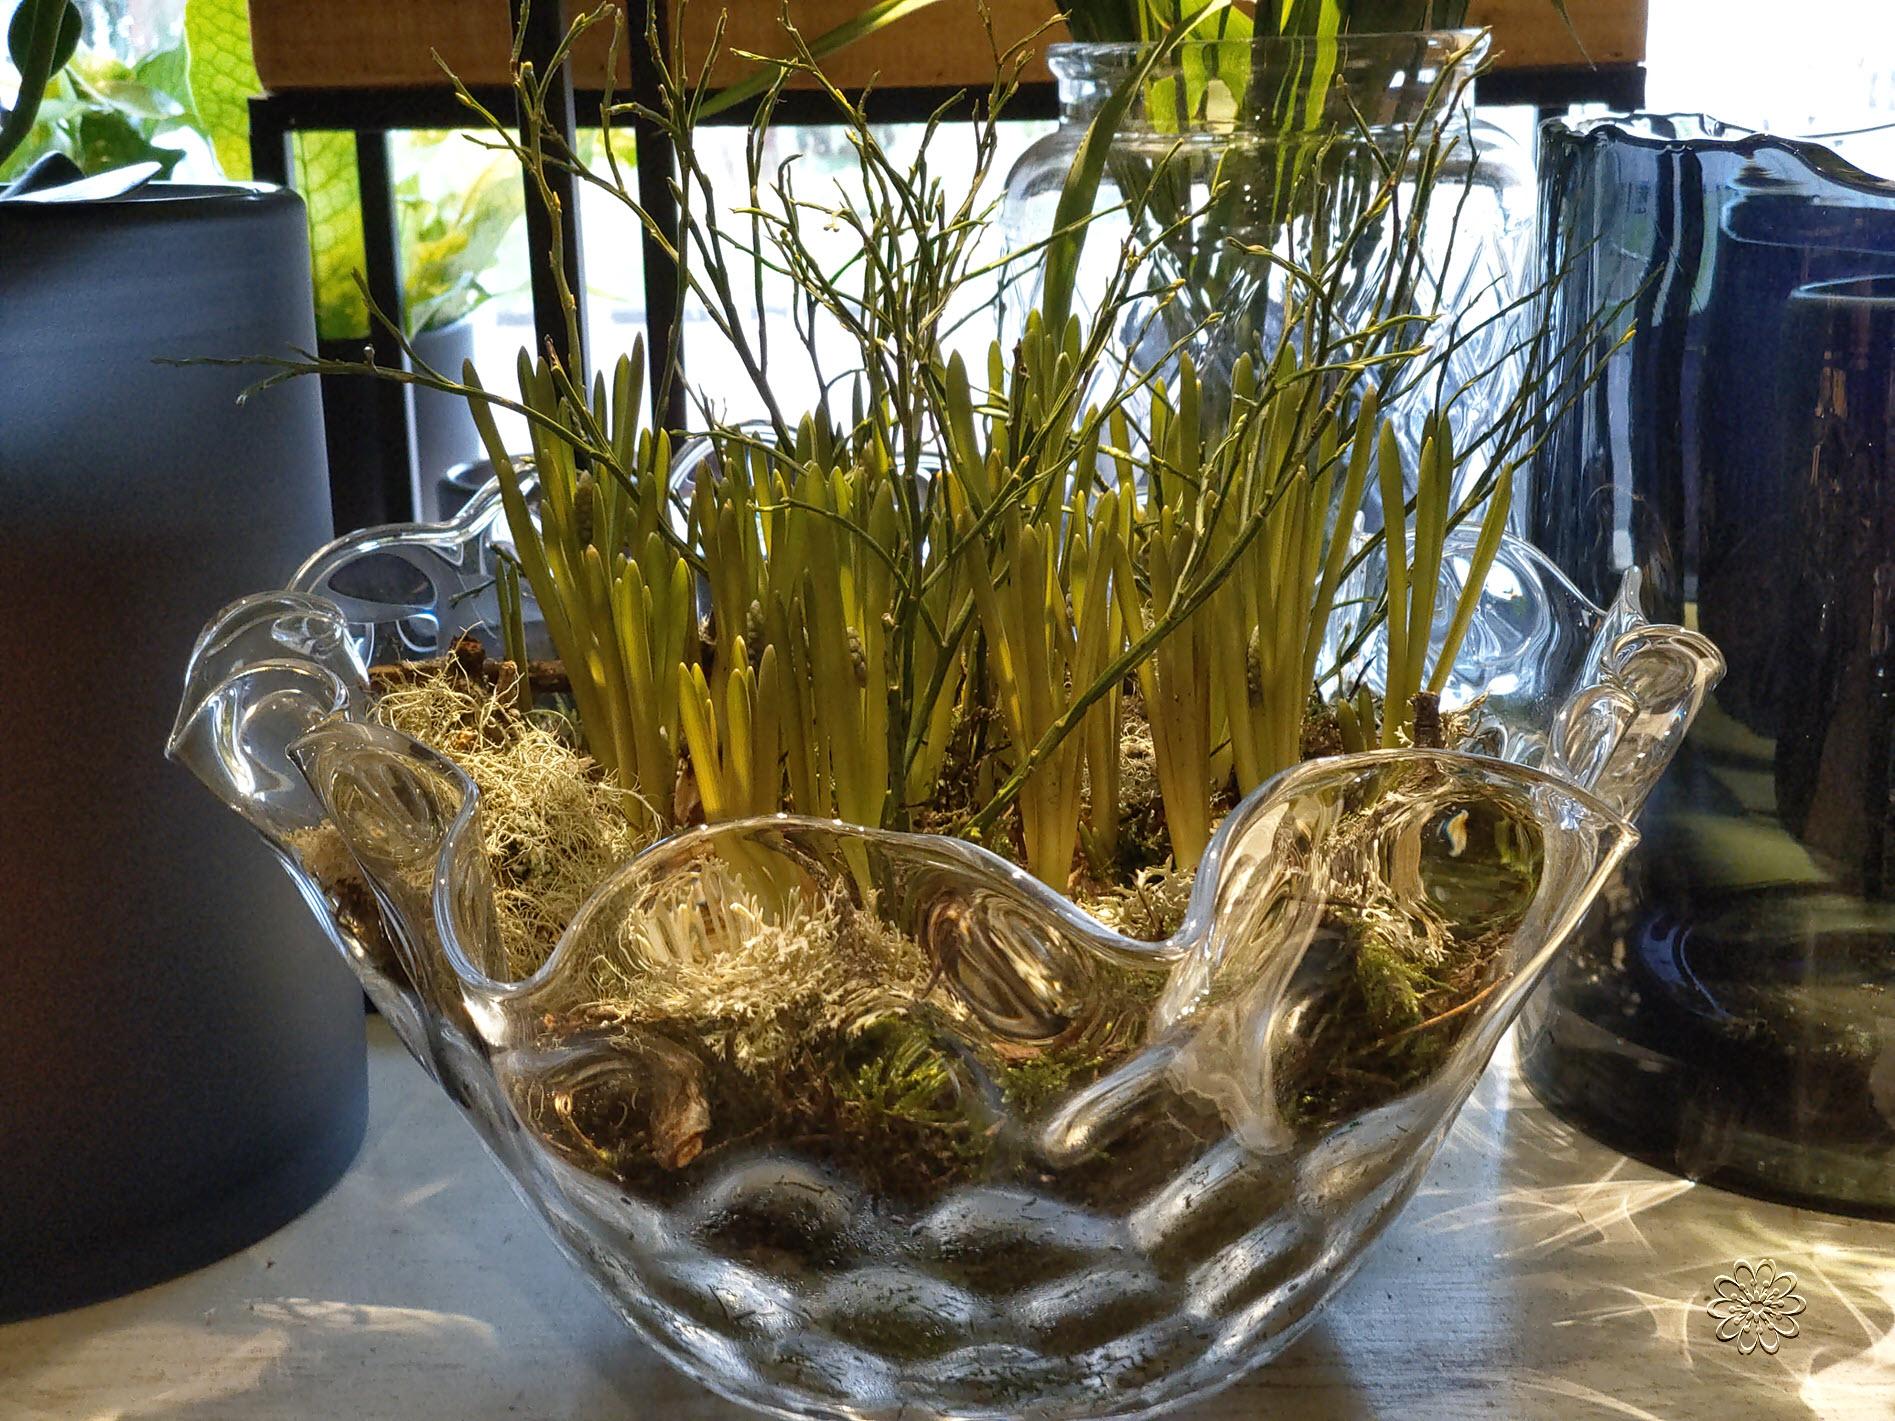 Bloemsierkunst-Groeneveld-kamerplanten-bollen-06